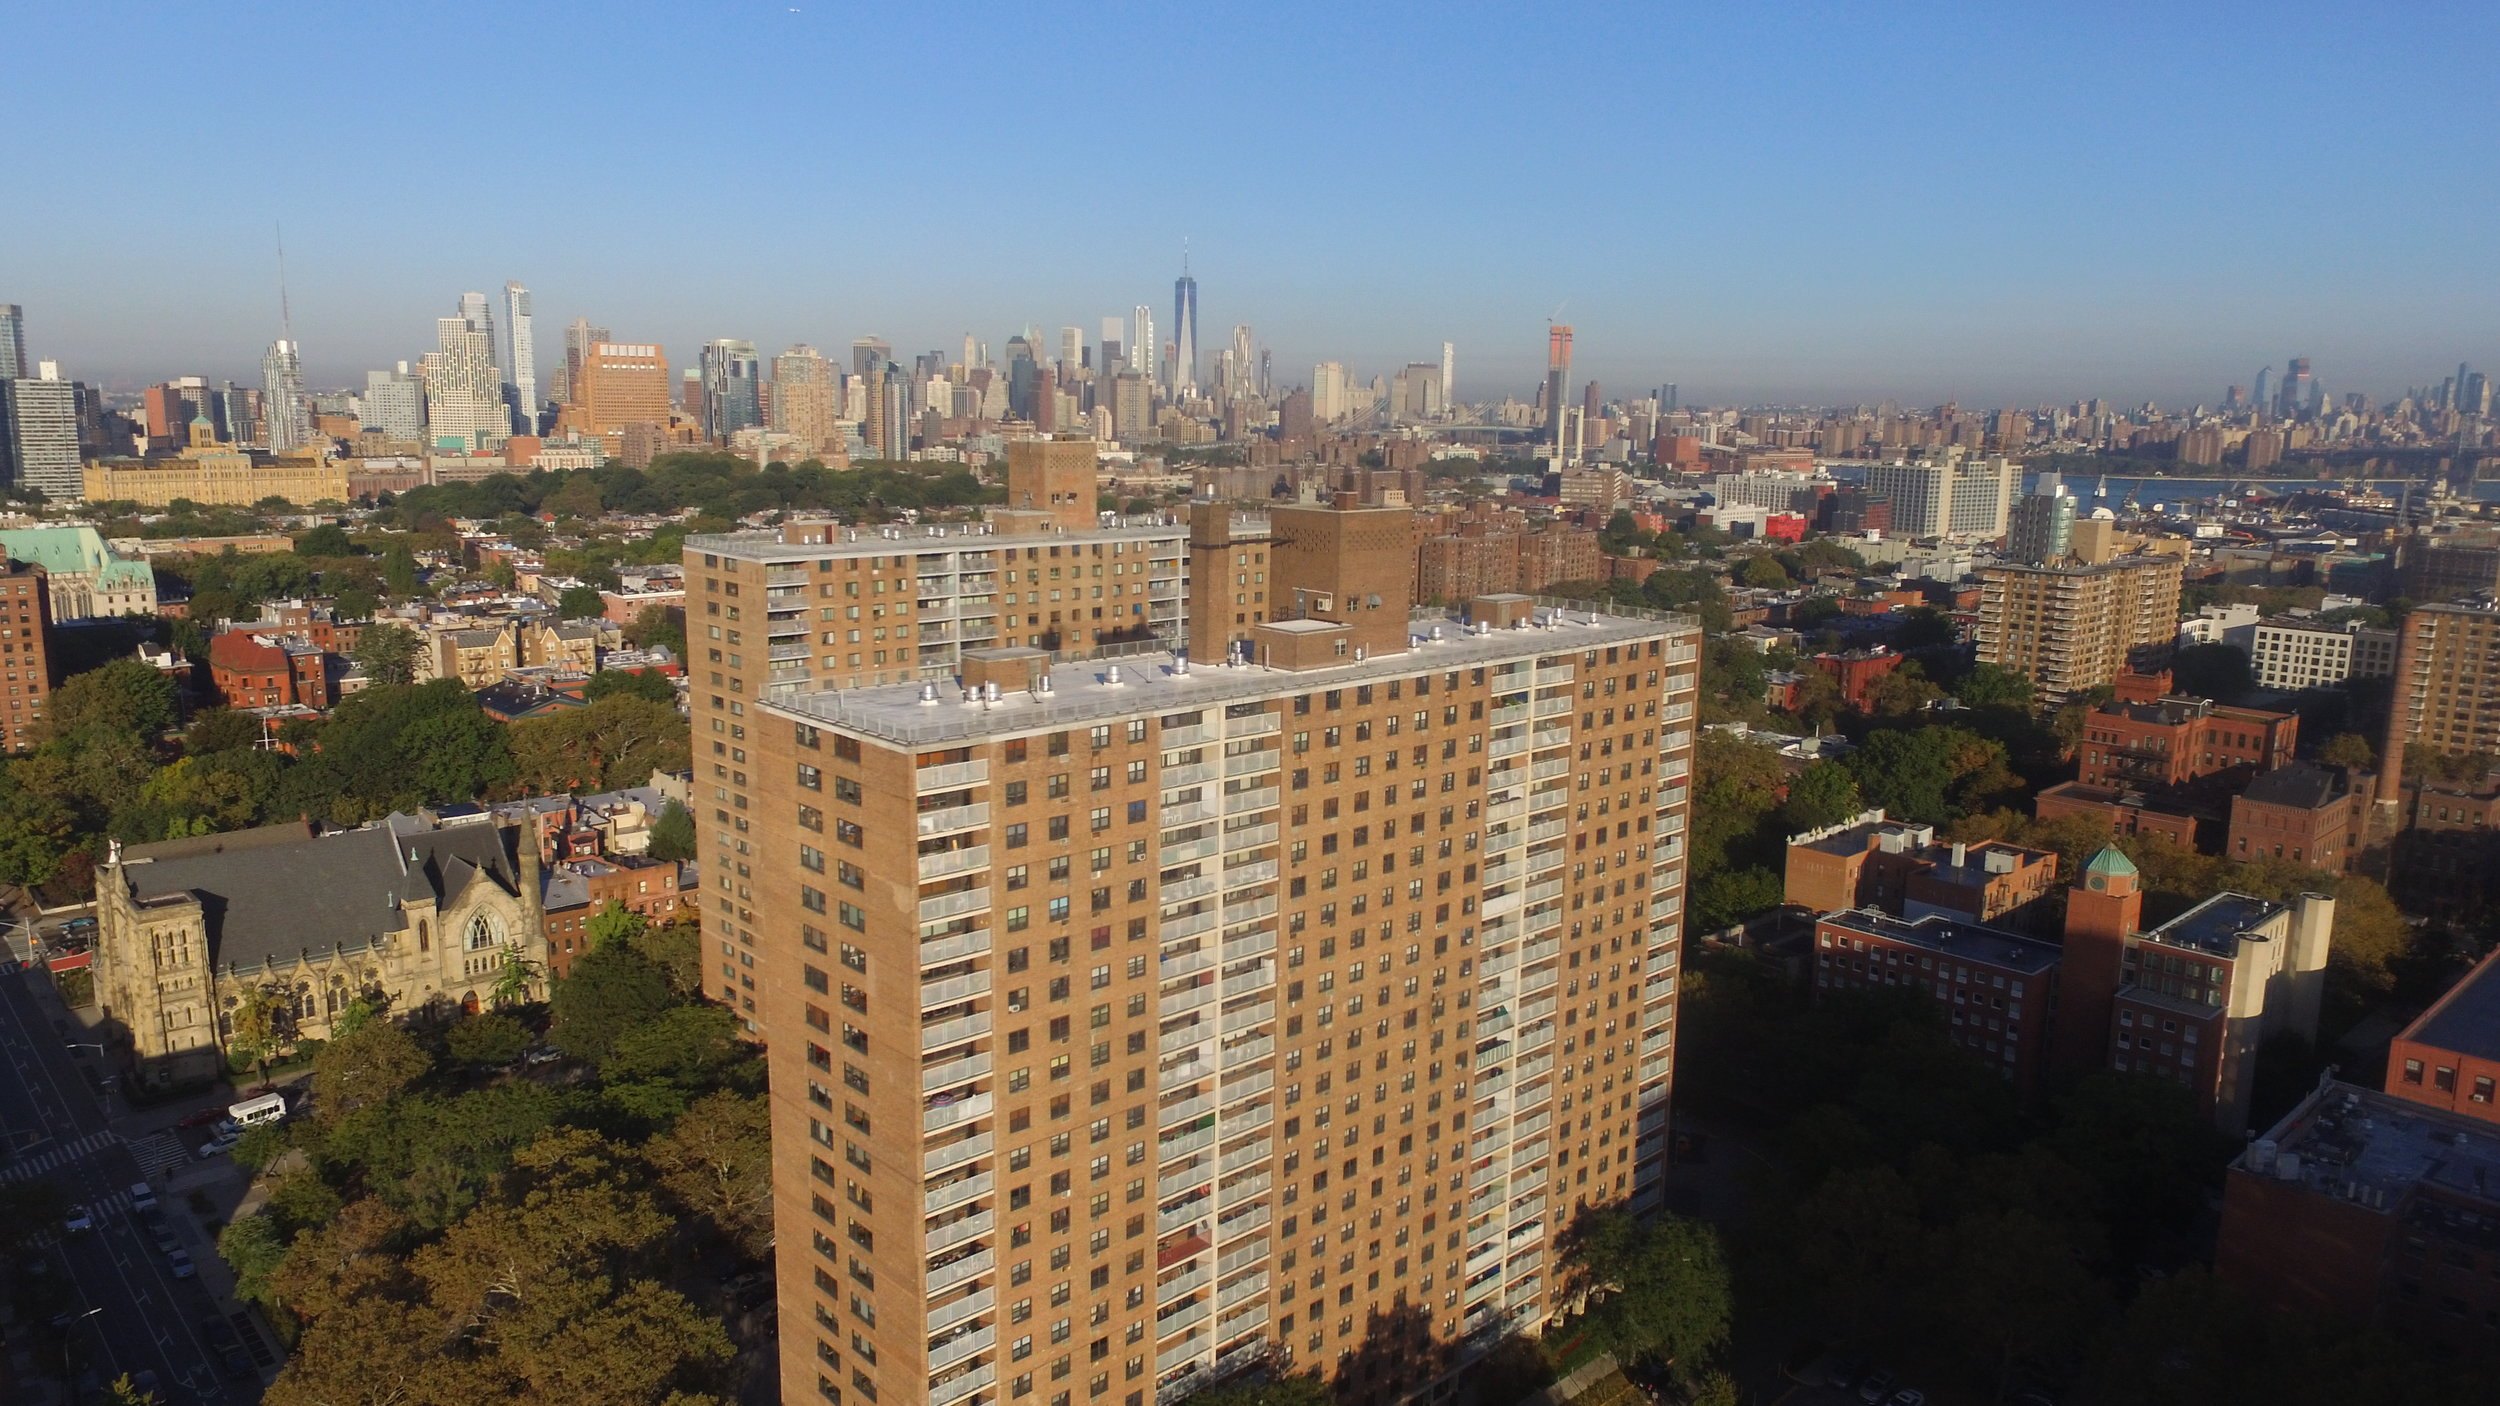 309 Lafayette Ave., Brooklyn, NY. Photo: Darryl Montgomery.